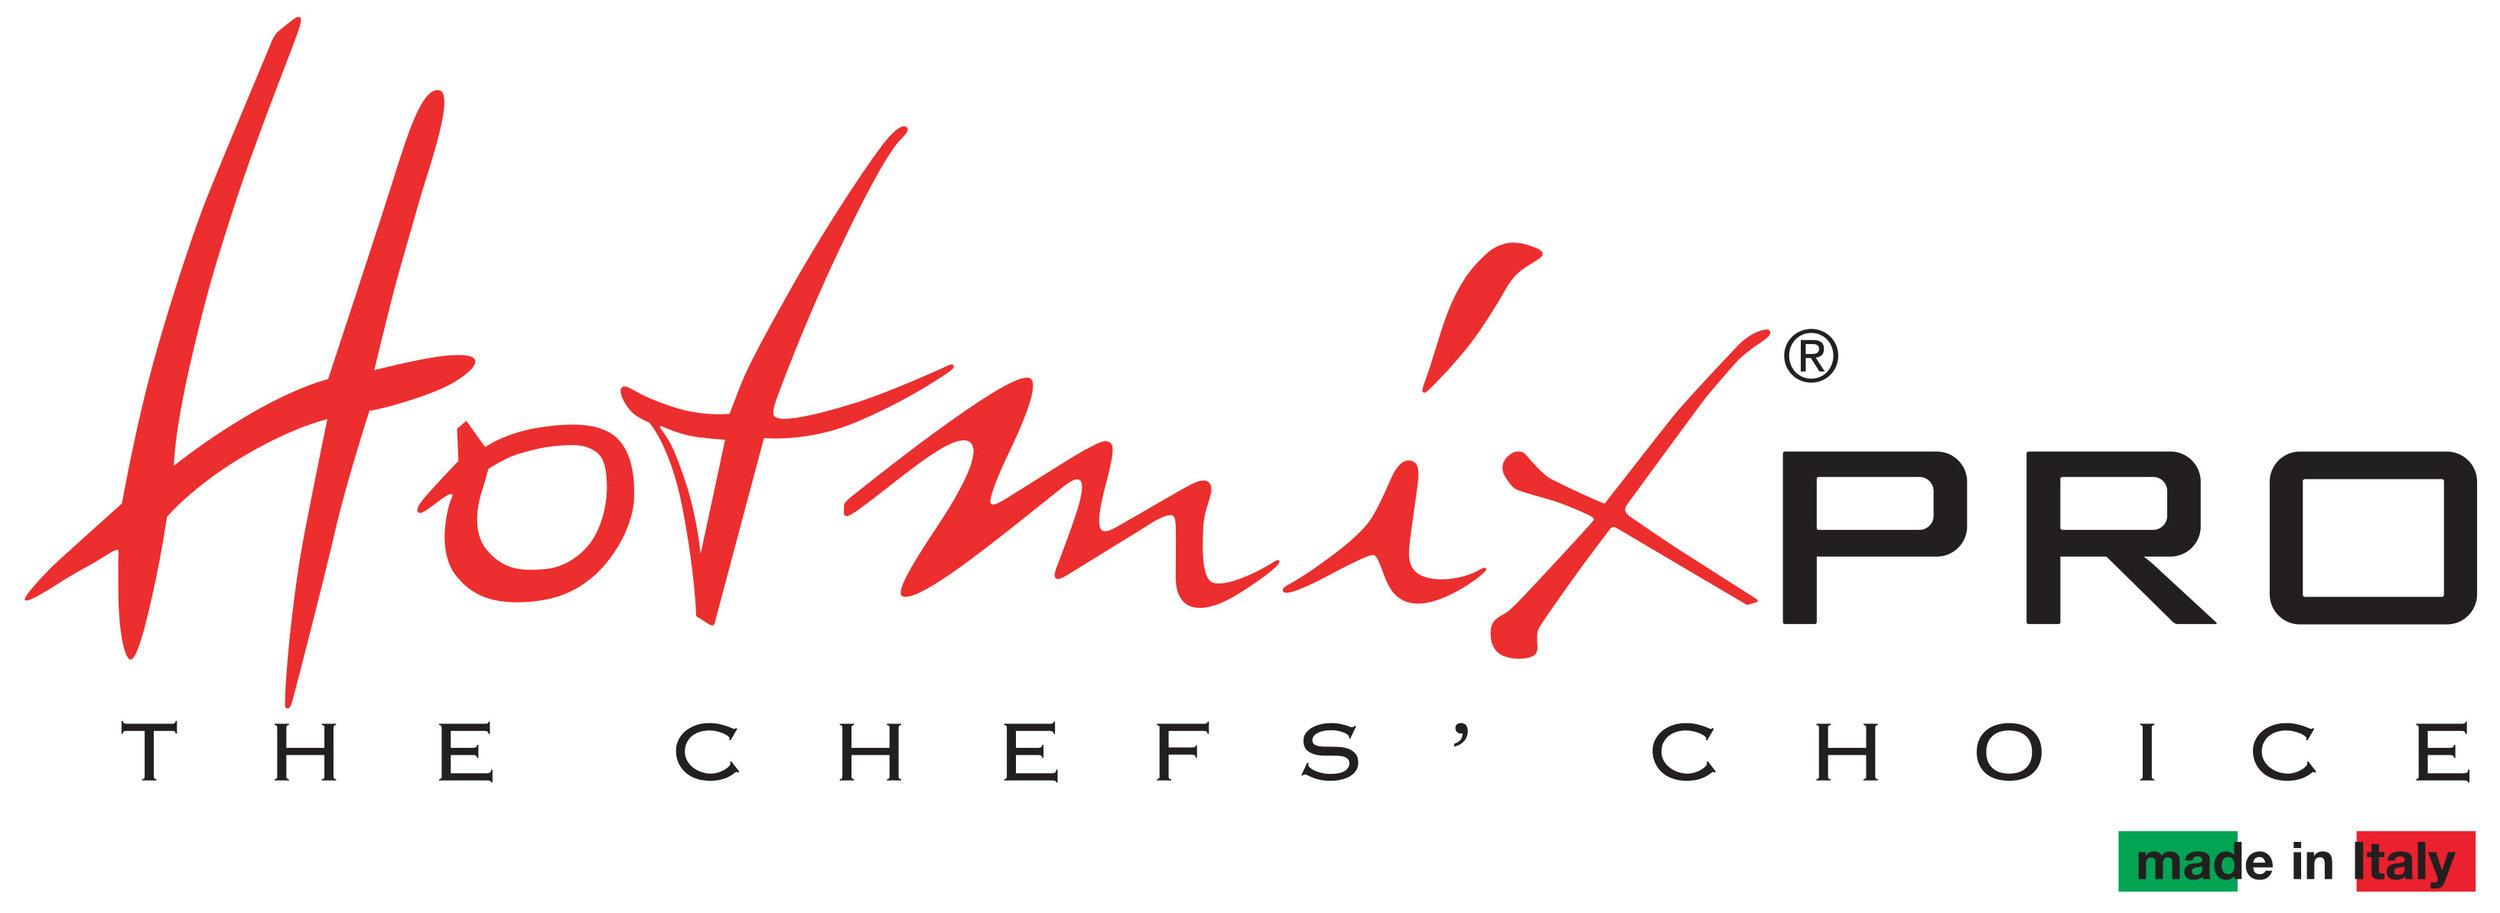 HotmixPRO Logo.jpg